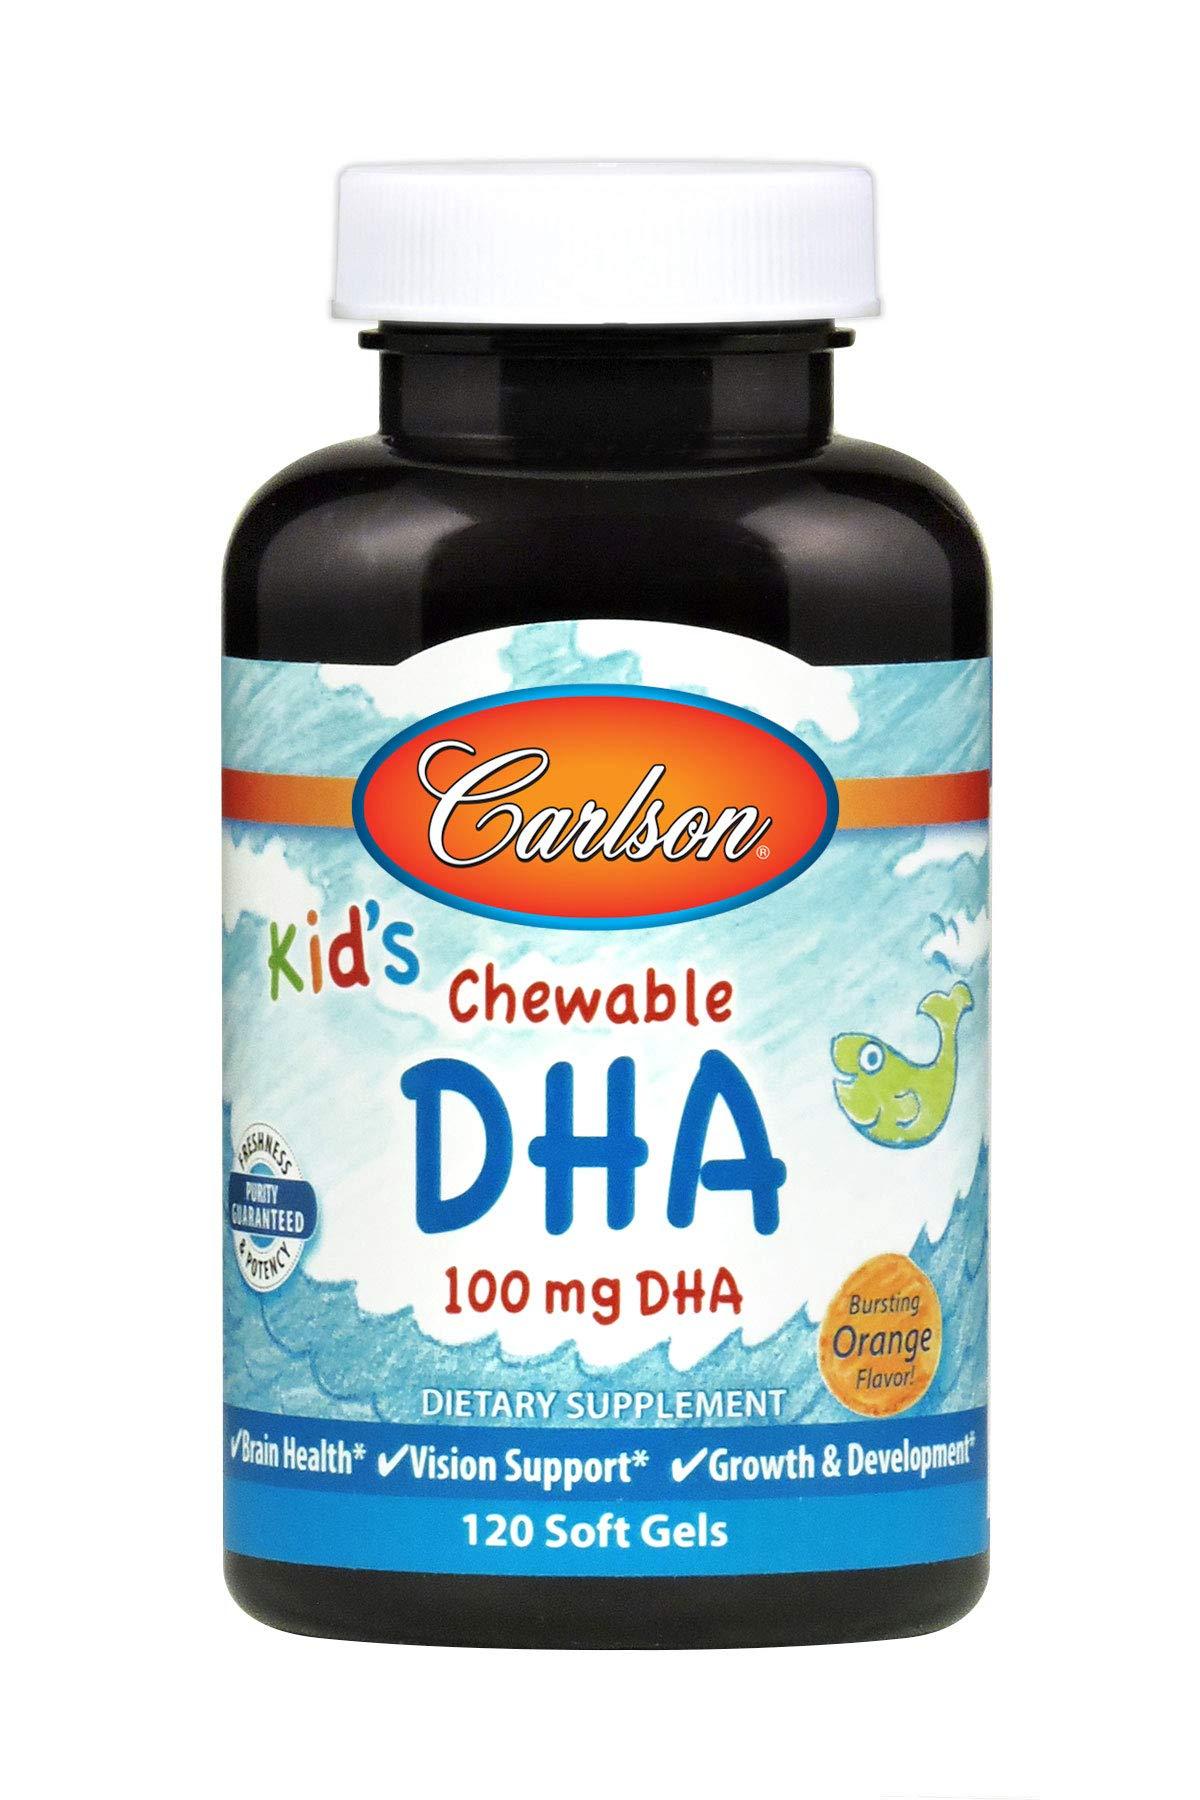 Carlson - Kid's Chewable DHA, 100 mg DHA, Brain & Vision Function, Growth & Development, Orange, 120 Soft gels by Carlson